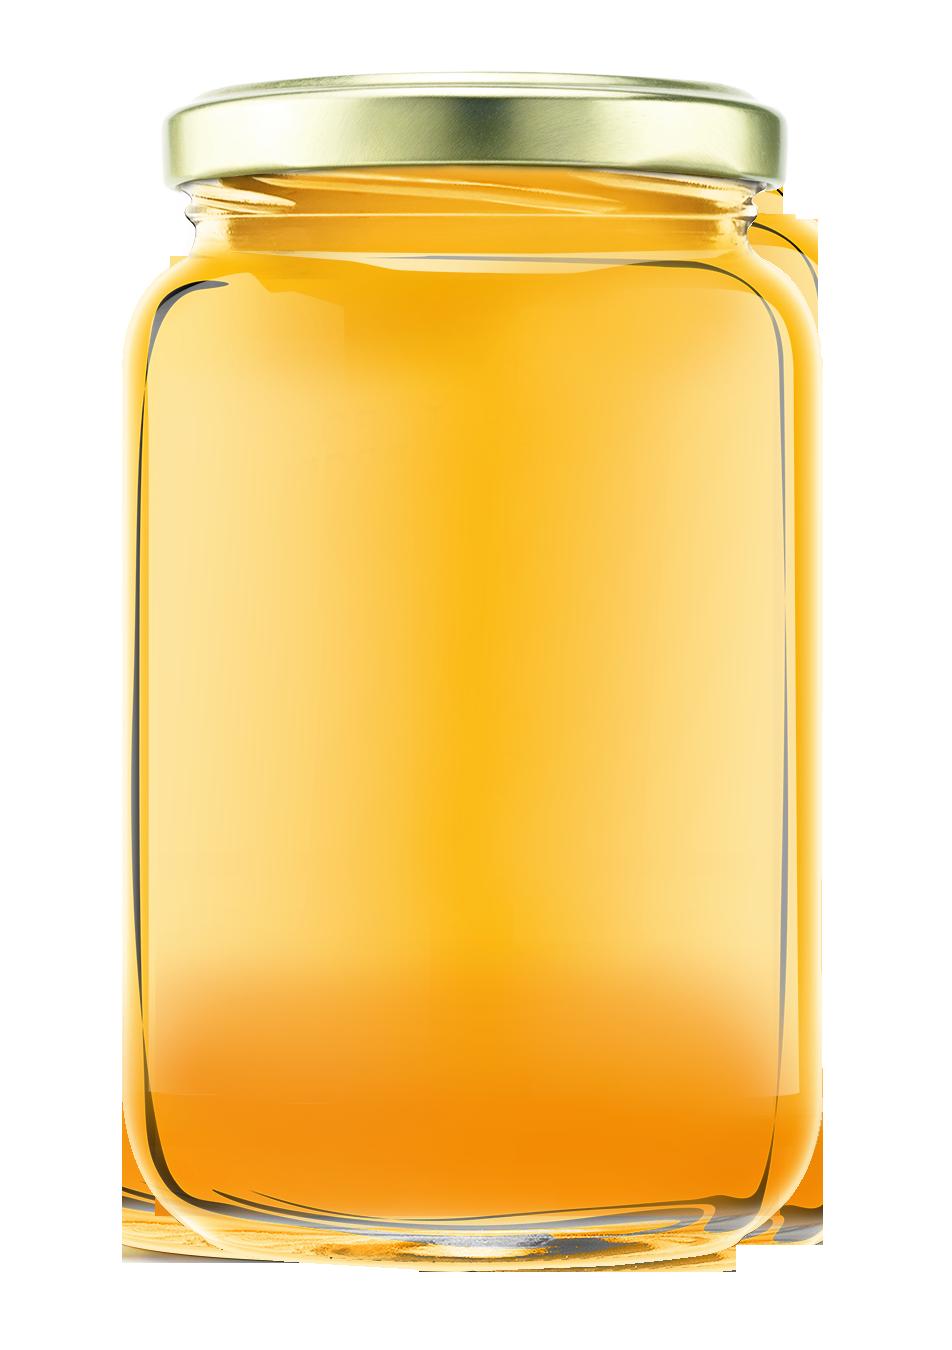 Honey Jar Png Image Honey Jar Honey Jar Image